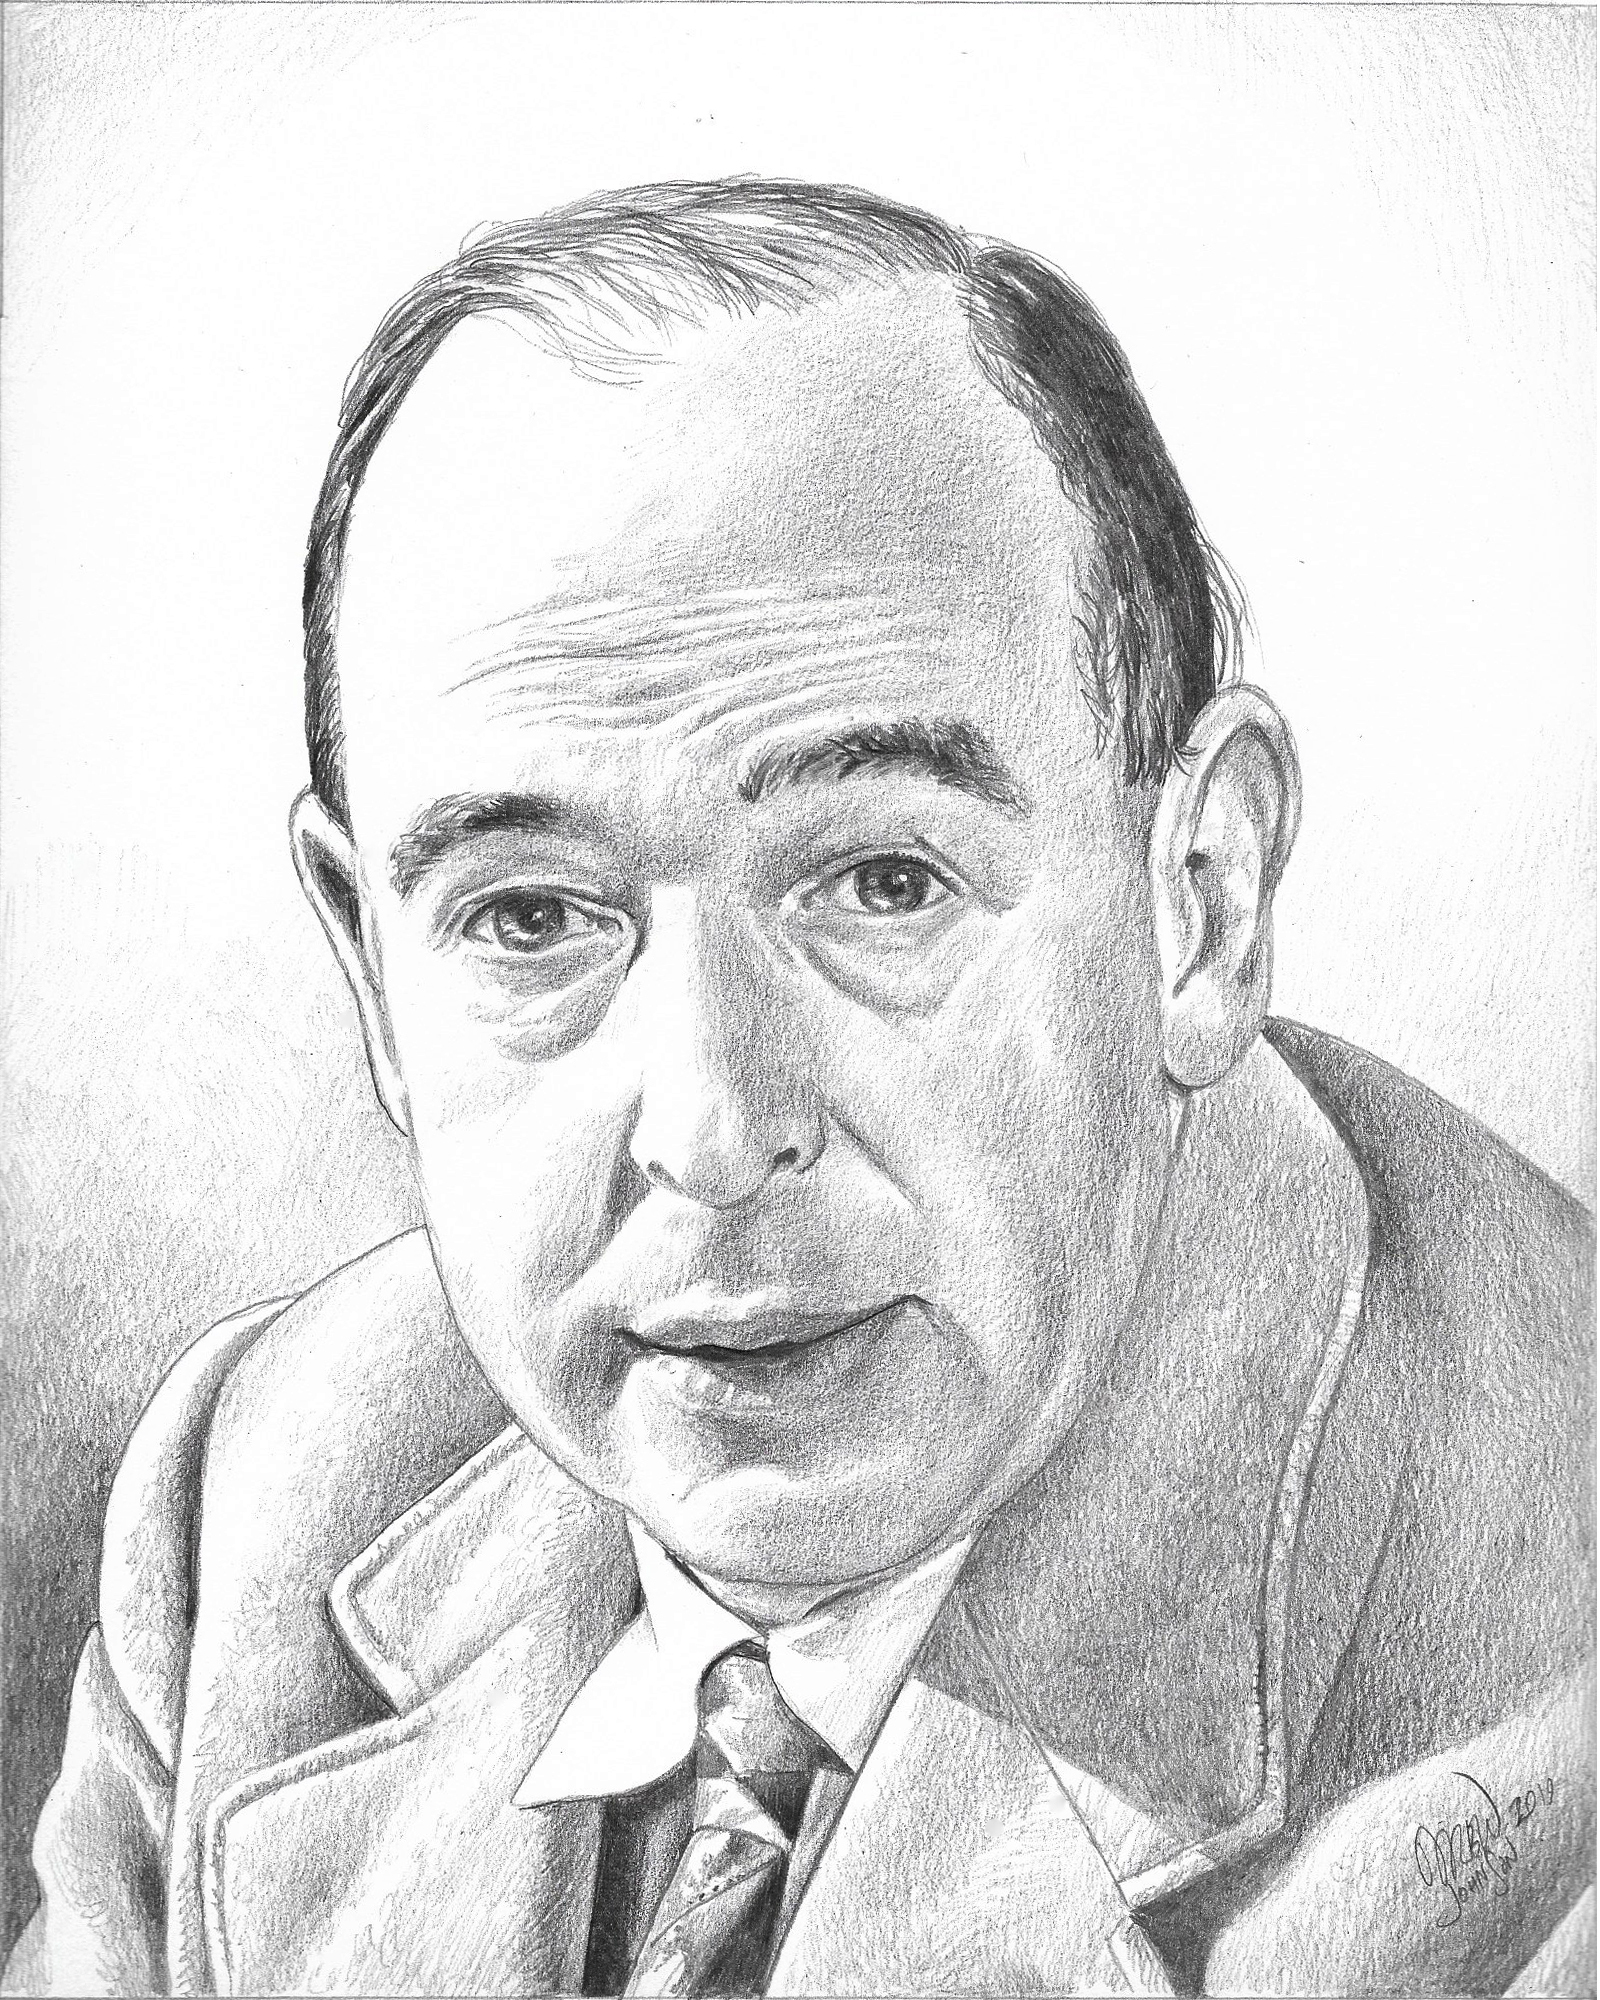 Portrait of C. S. Lewis